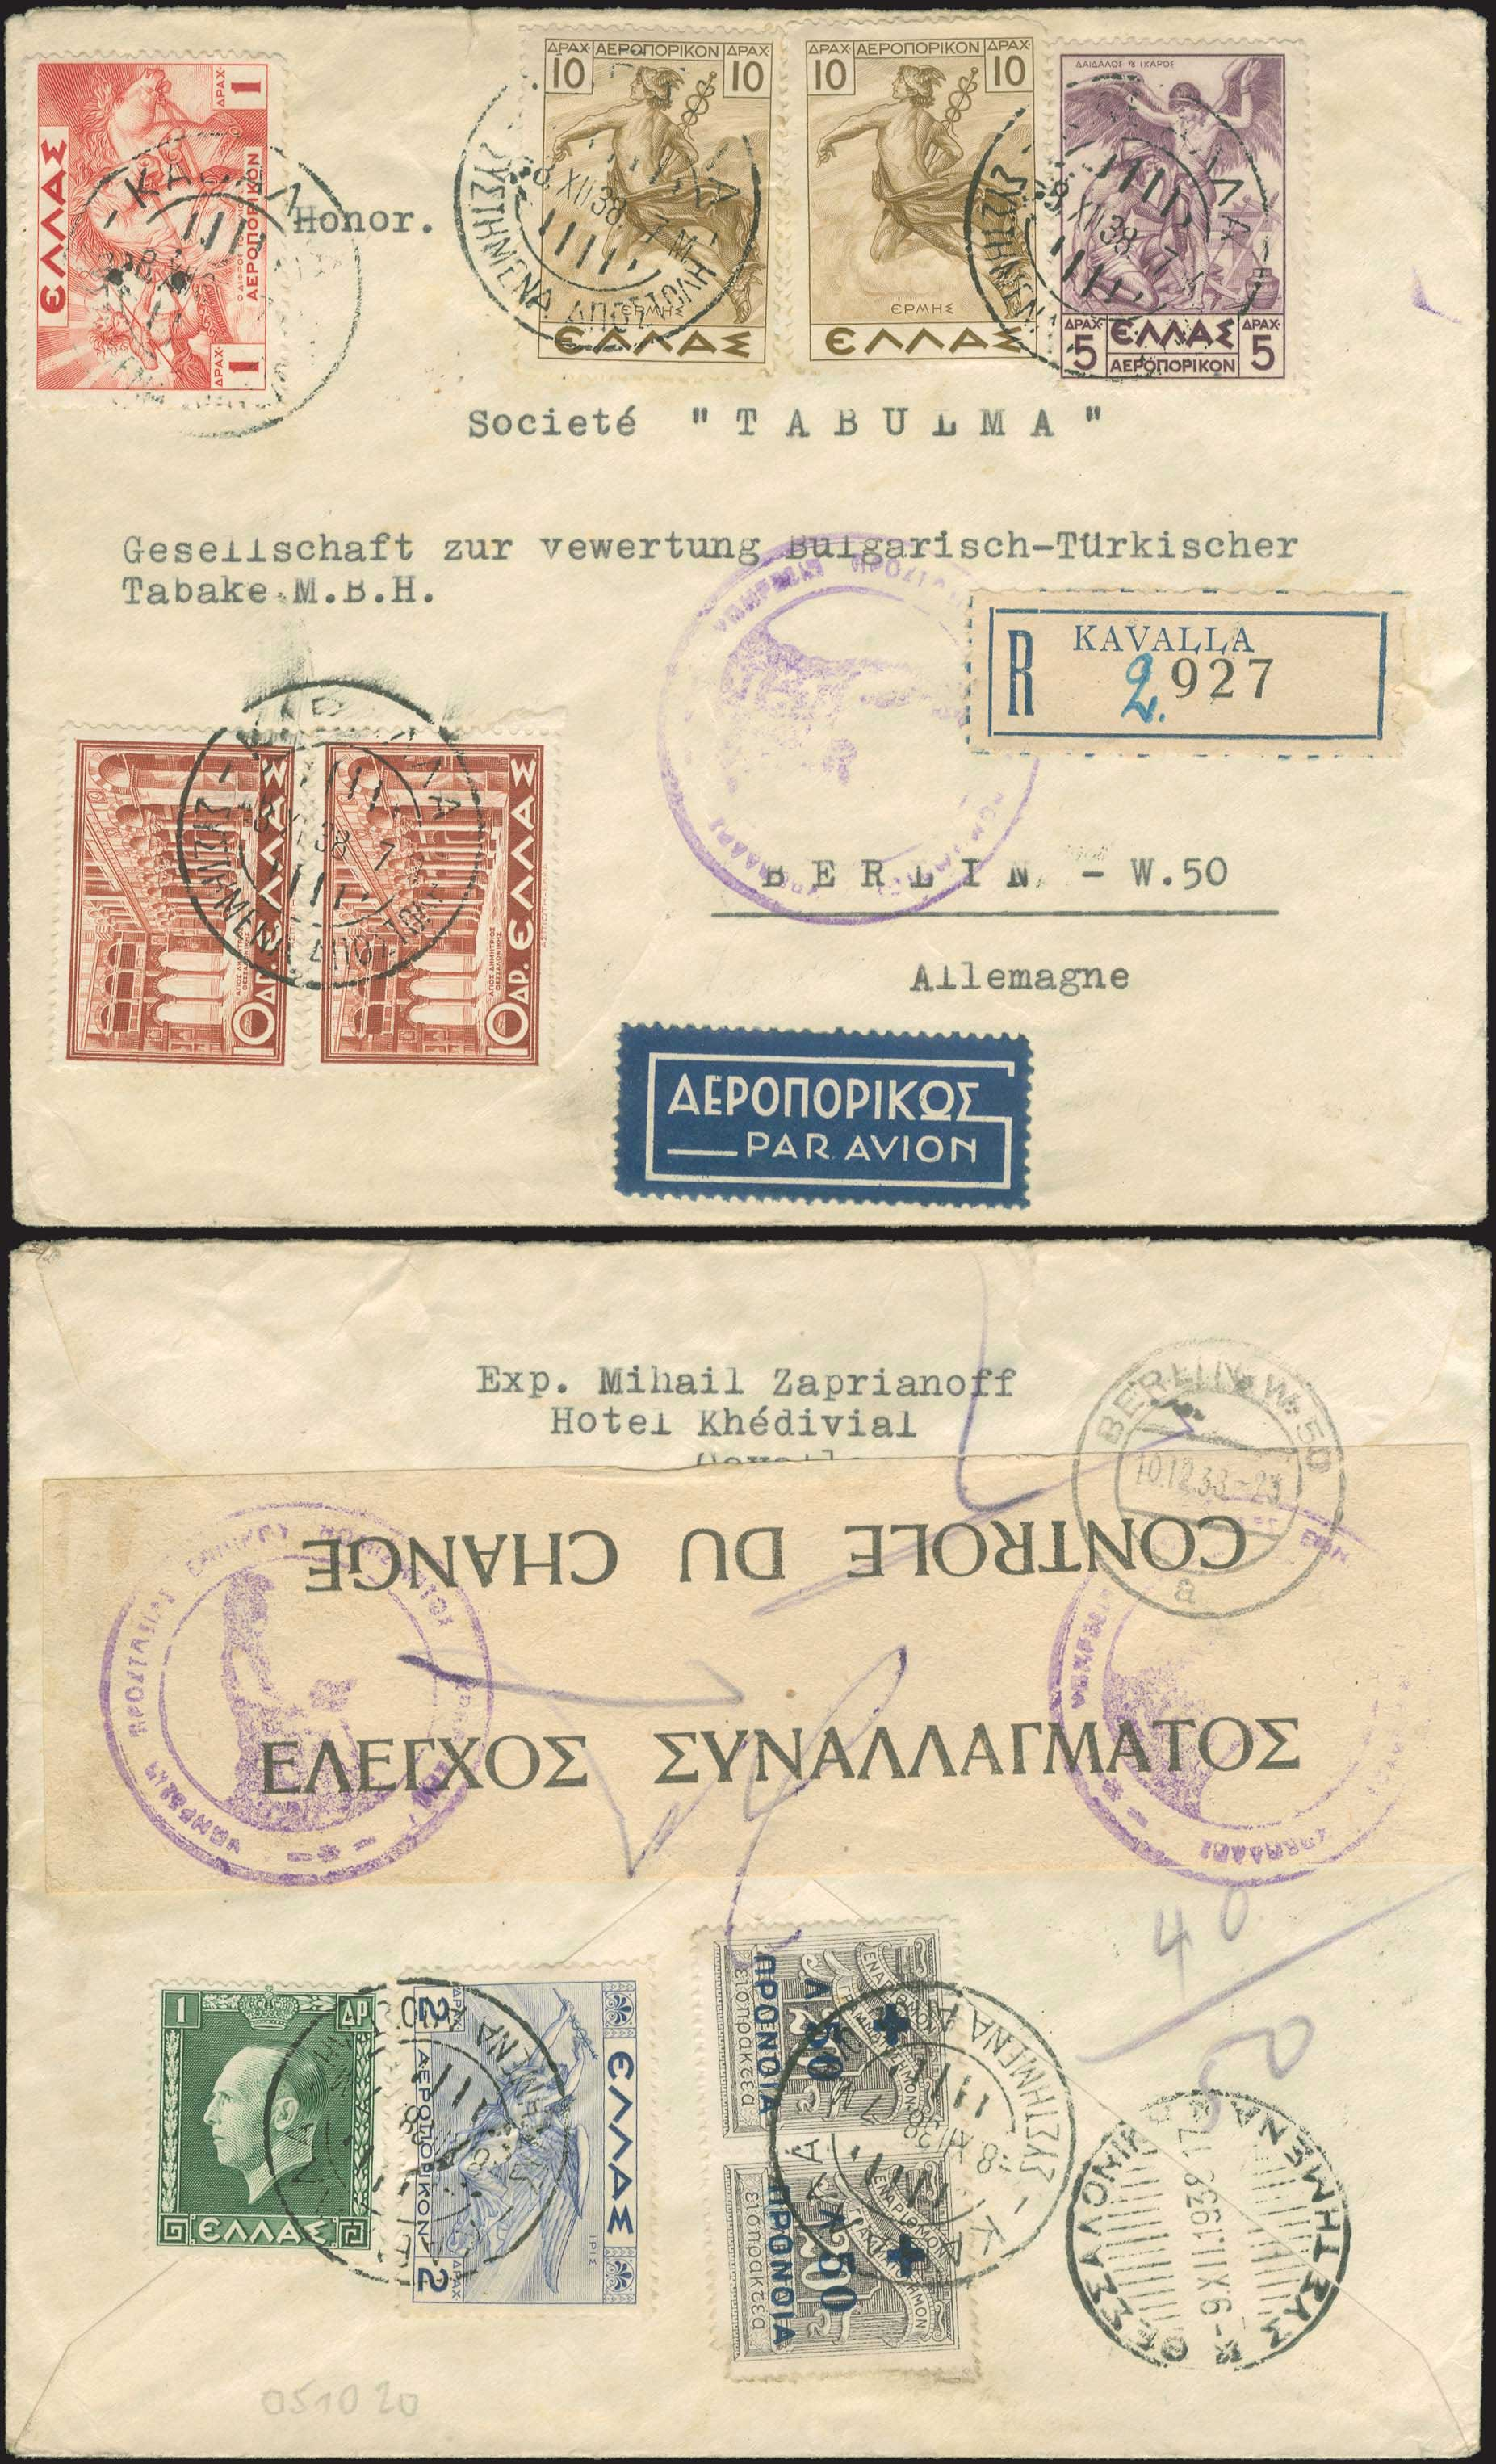 Lot 842 - -  POSTMARKS & CANCELLATIONS exchange control cachets -  A. Karamitsos Public Auction 668 General Philatelic Auction